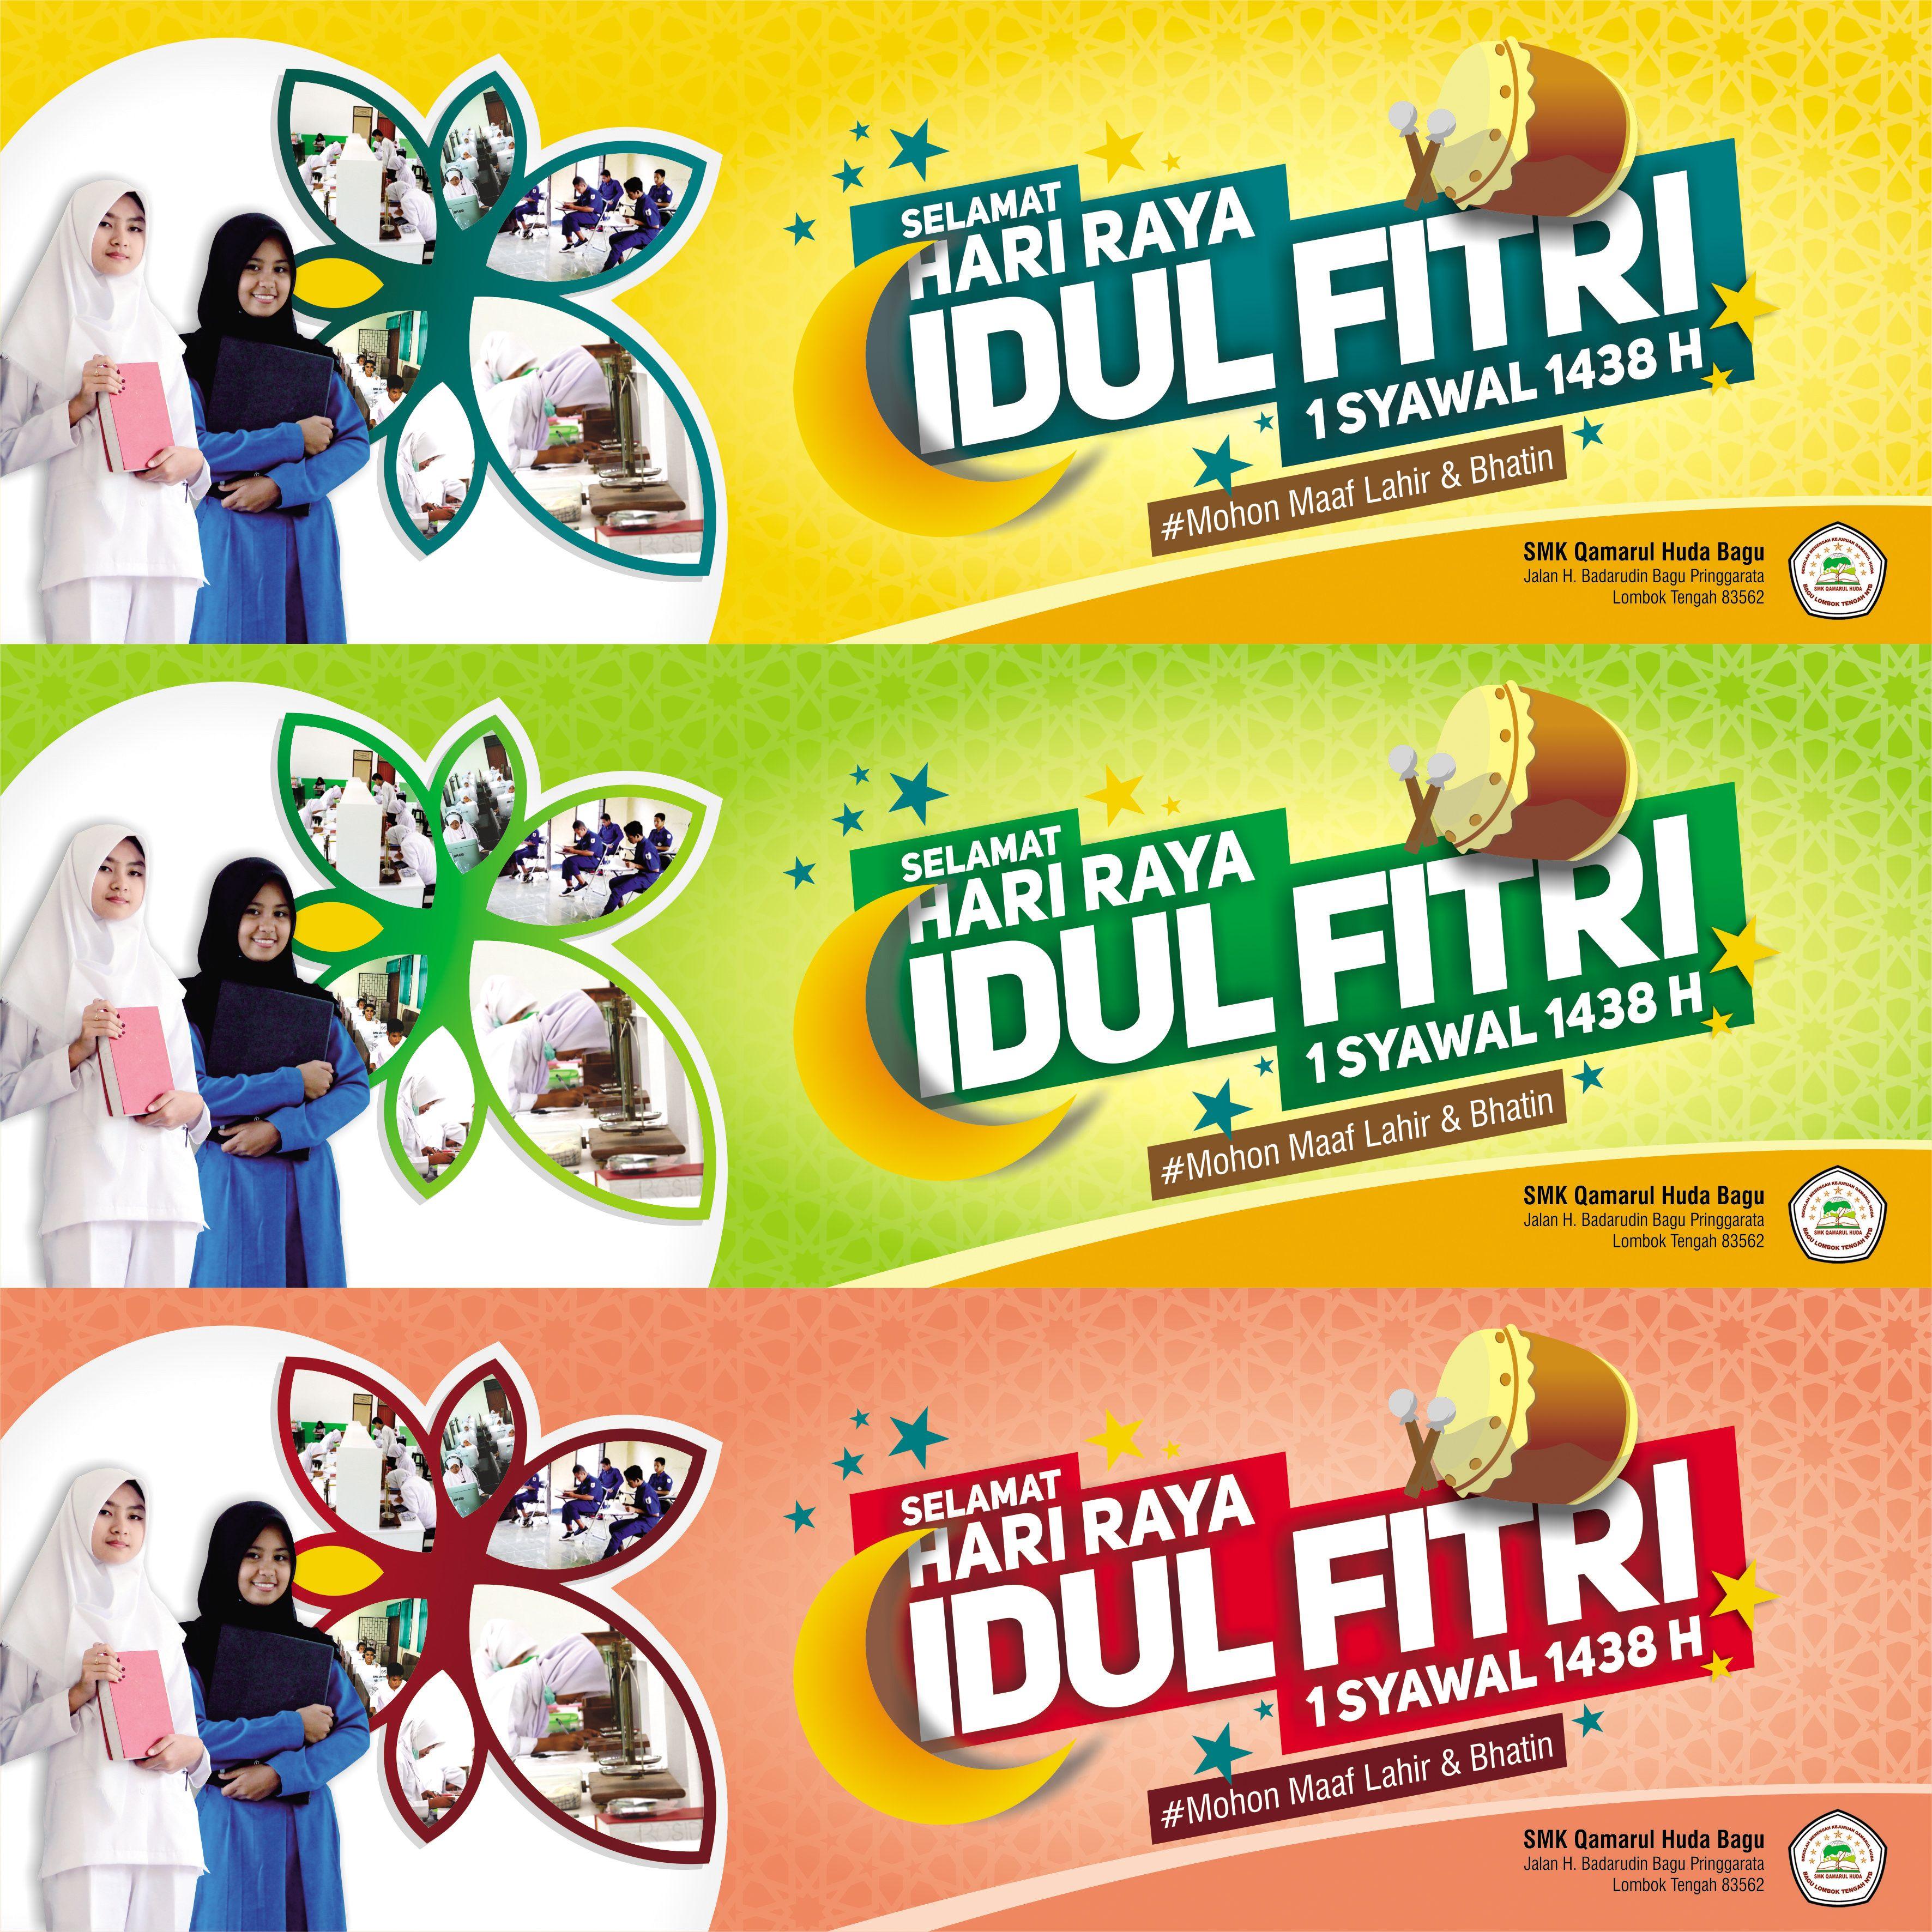 Spanduk Idul Fitri H Client Smk Qamarul Huda Lombok Ntb